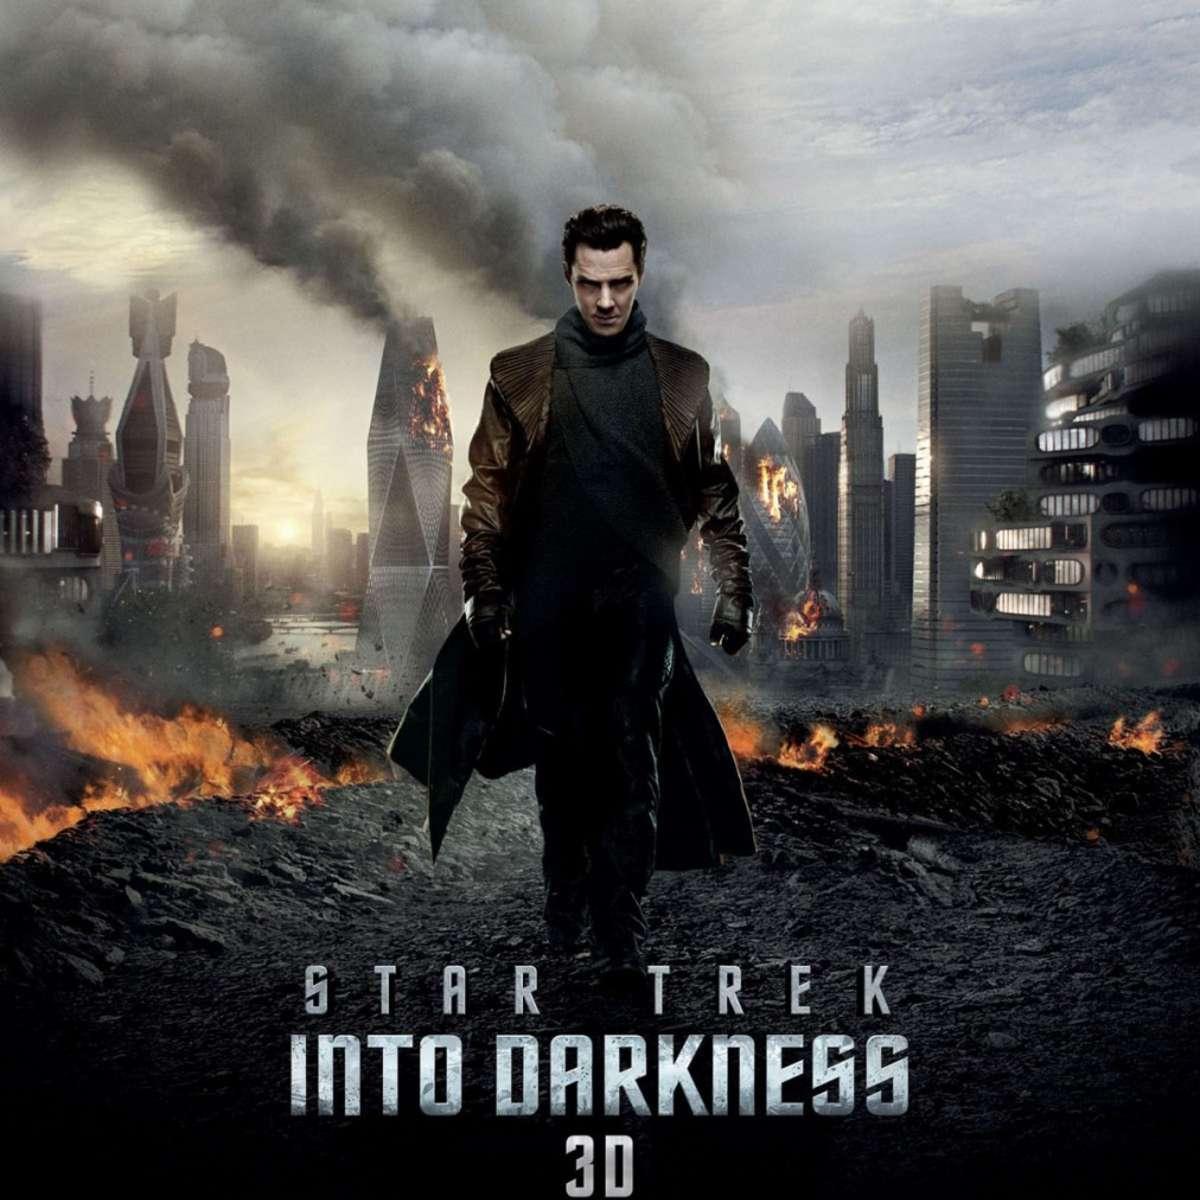 star_trek_into_darkness_new_imax_poster.jpg